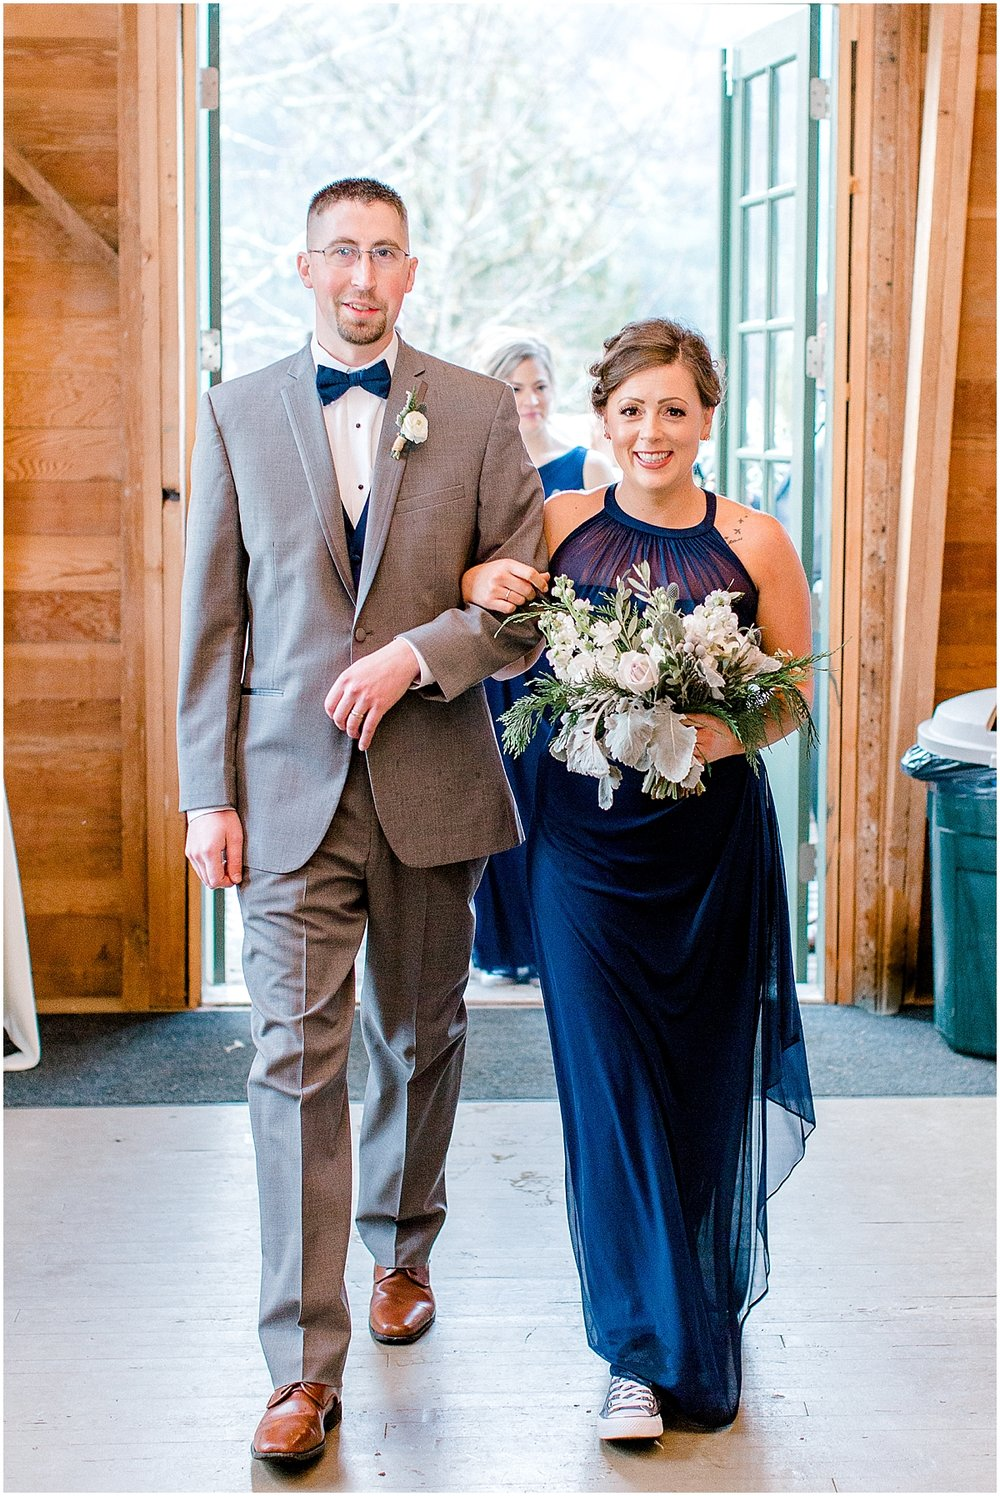 Chehalis Washington Winter Wedding Silver and White | Willapa Hills Farm Wedding | Eastham | Emma Rose Company PNW Light and Airy Wedding Photographer_0042.jpg